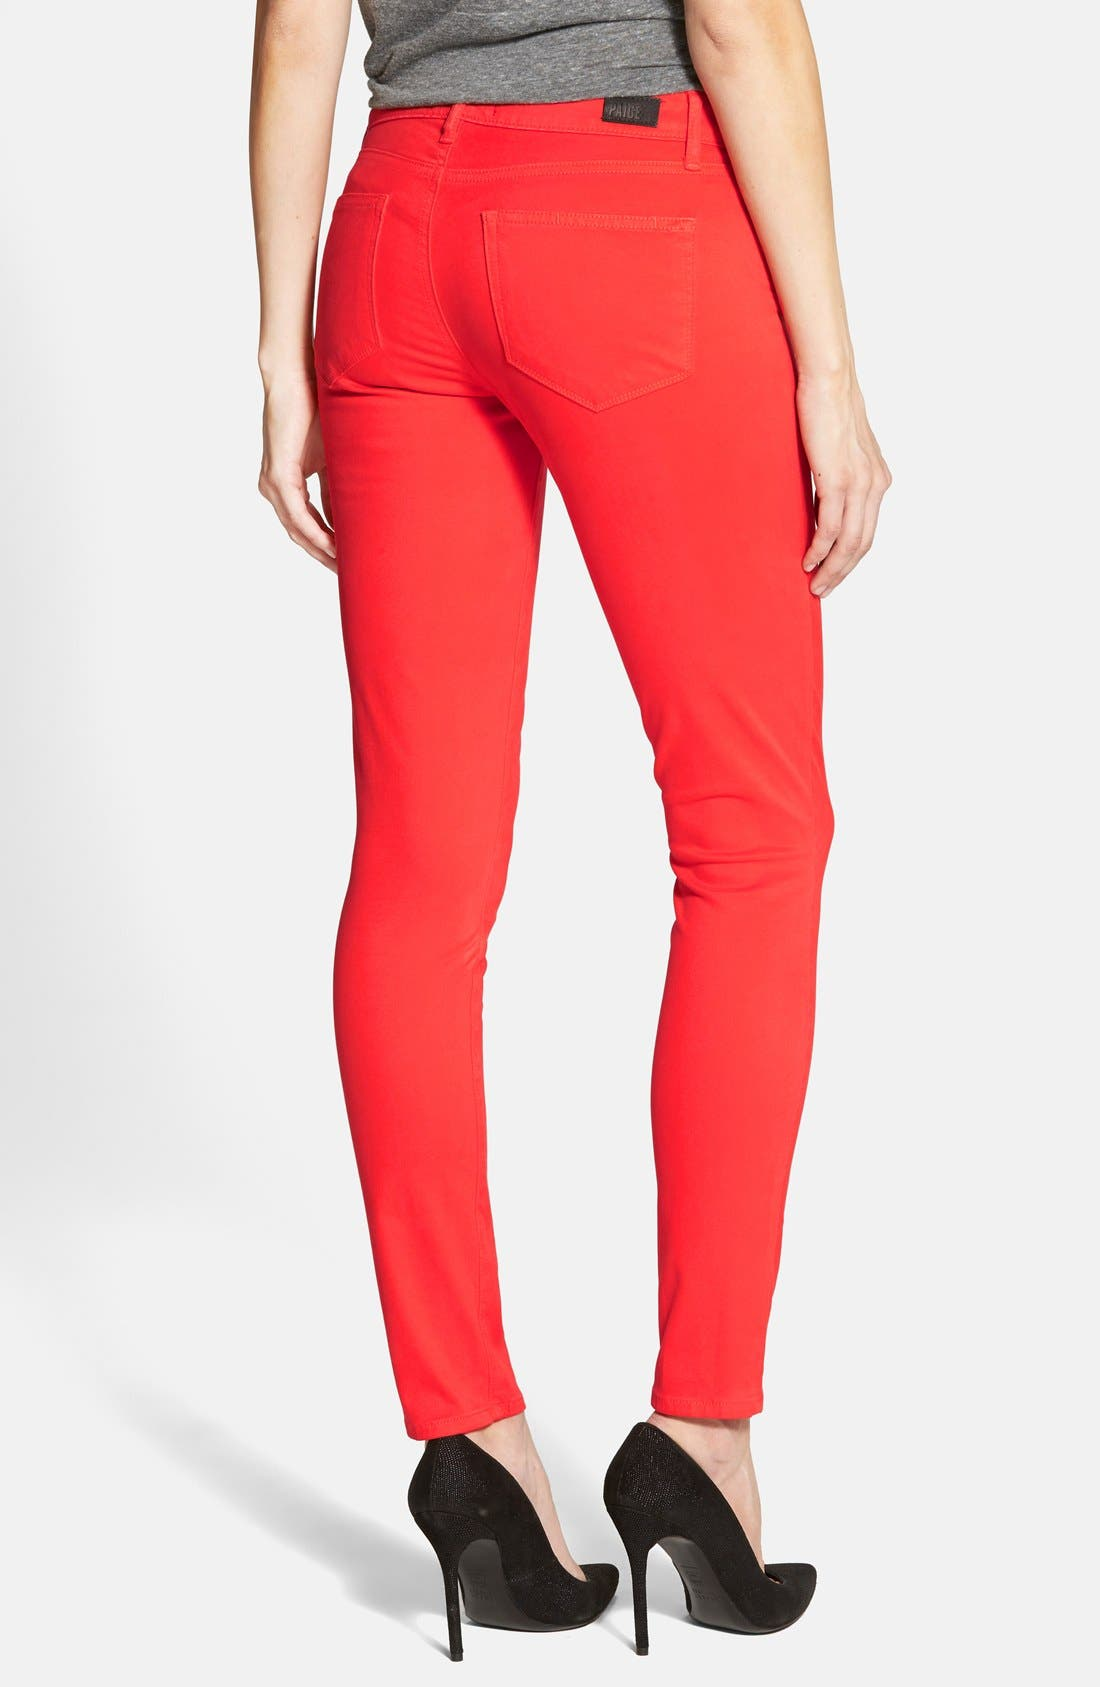 Denim 'Verdugo' Ultra Skinny Jeans,                             Alternate thumbnail 3, color,                             600